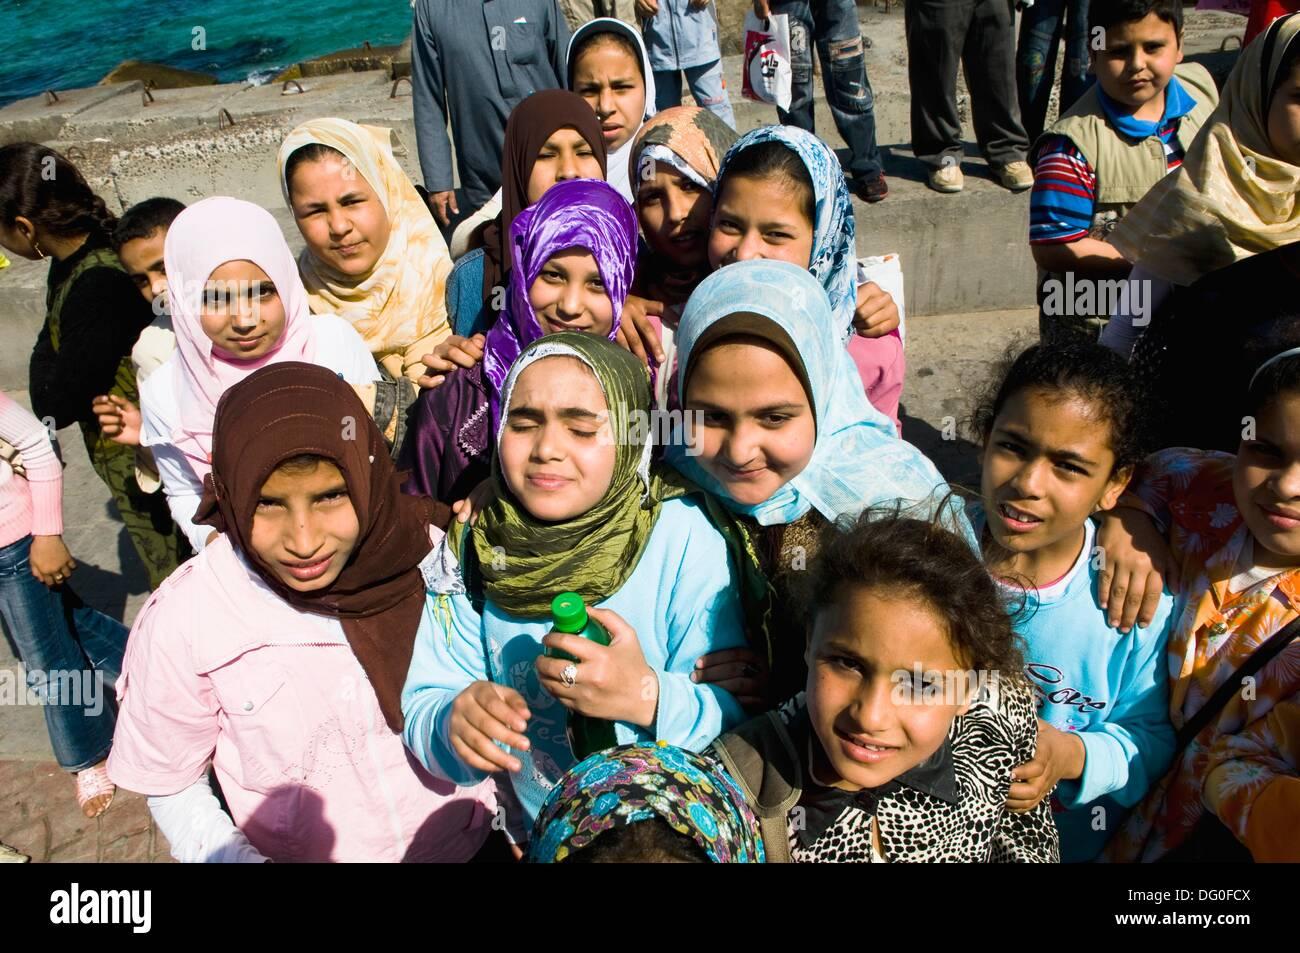 Egyptian school girls during a school trip to Alexandria, Egypt. - Stock Image